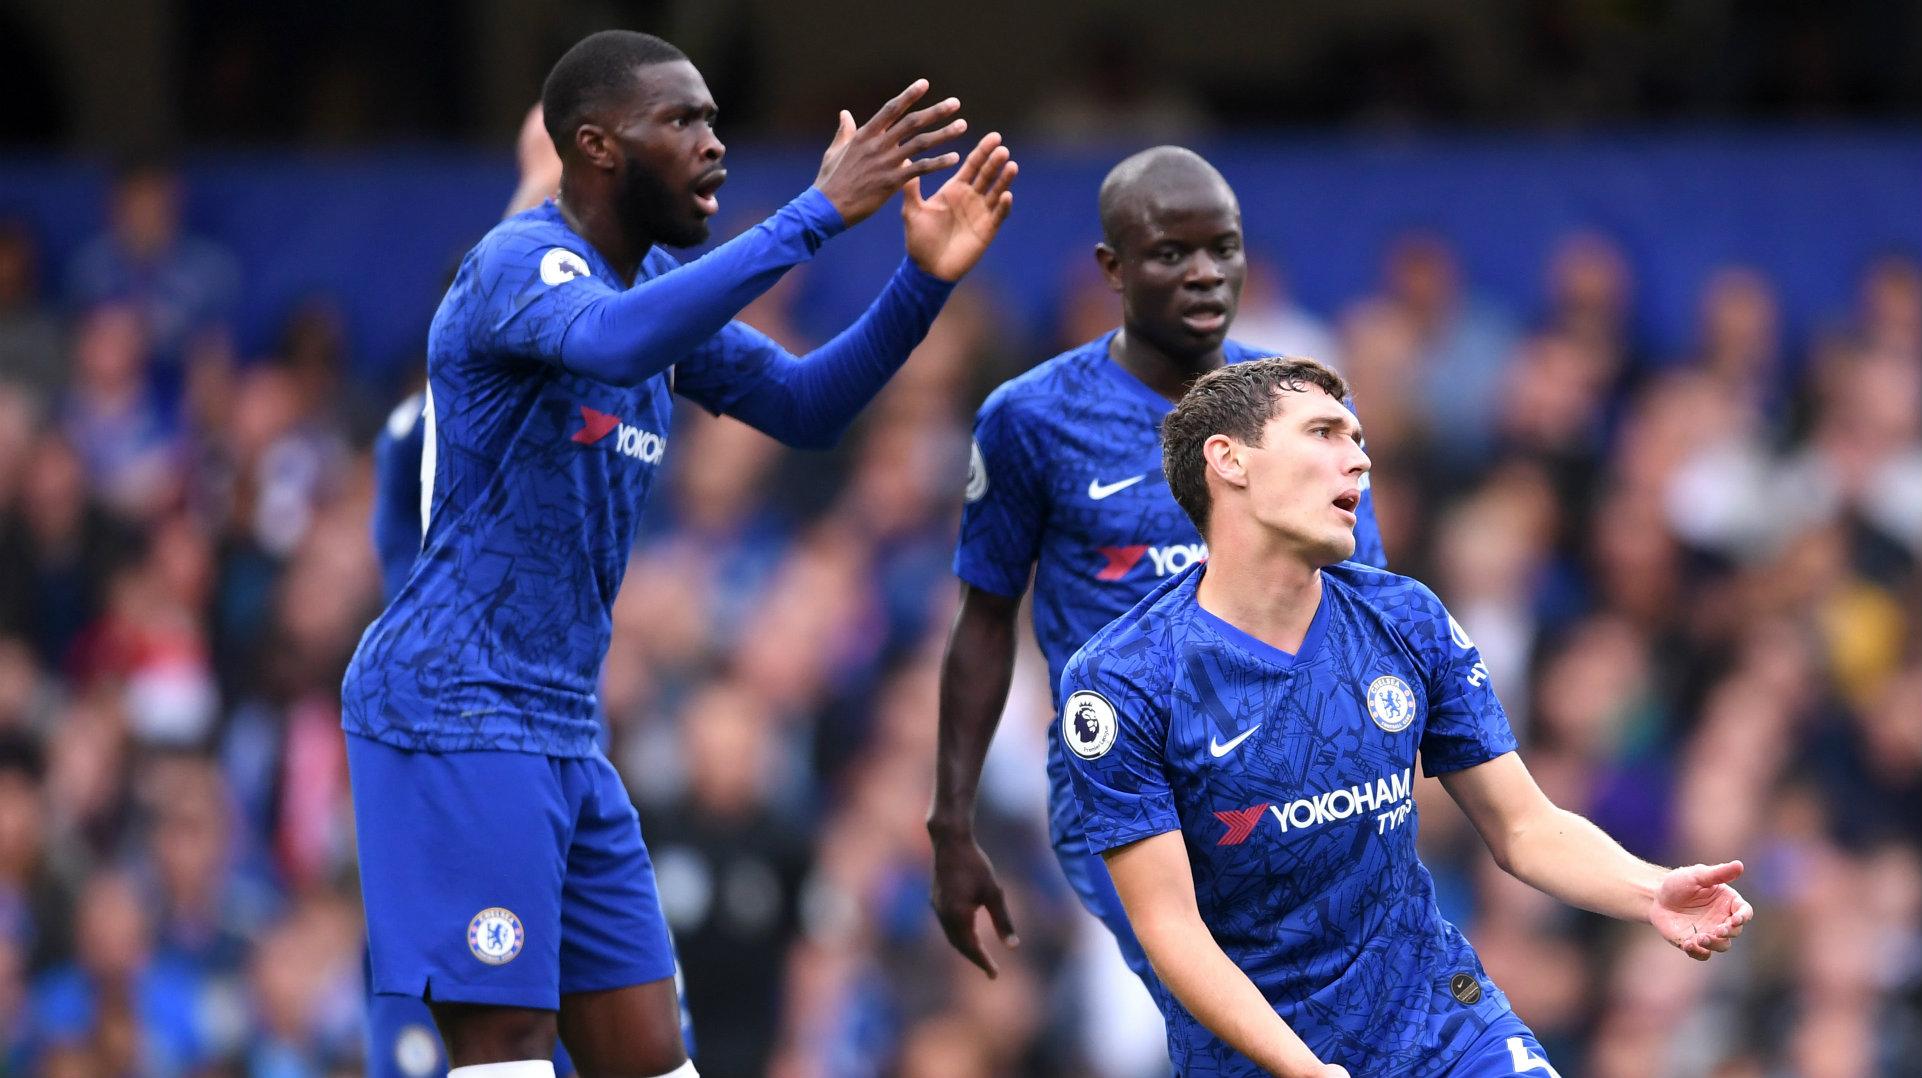 Andreas Christensen Chelsea vs Liverpool 2019-20